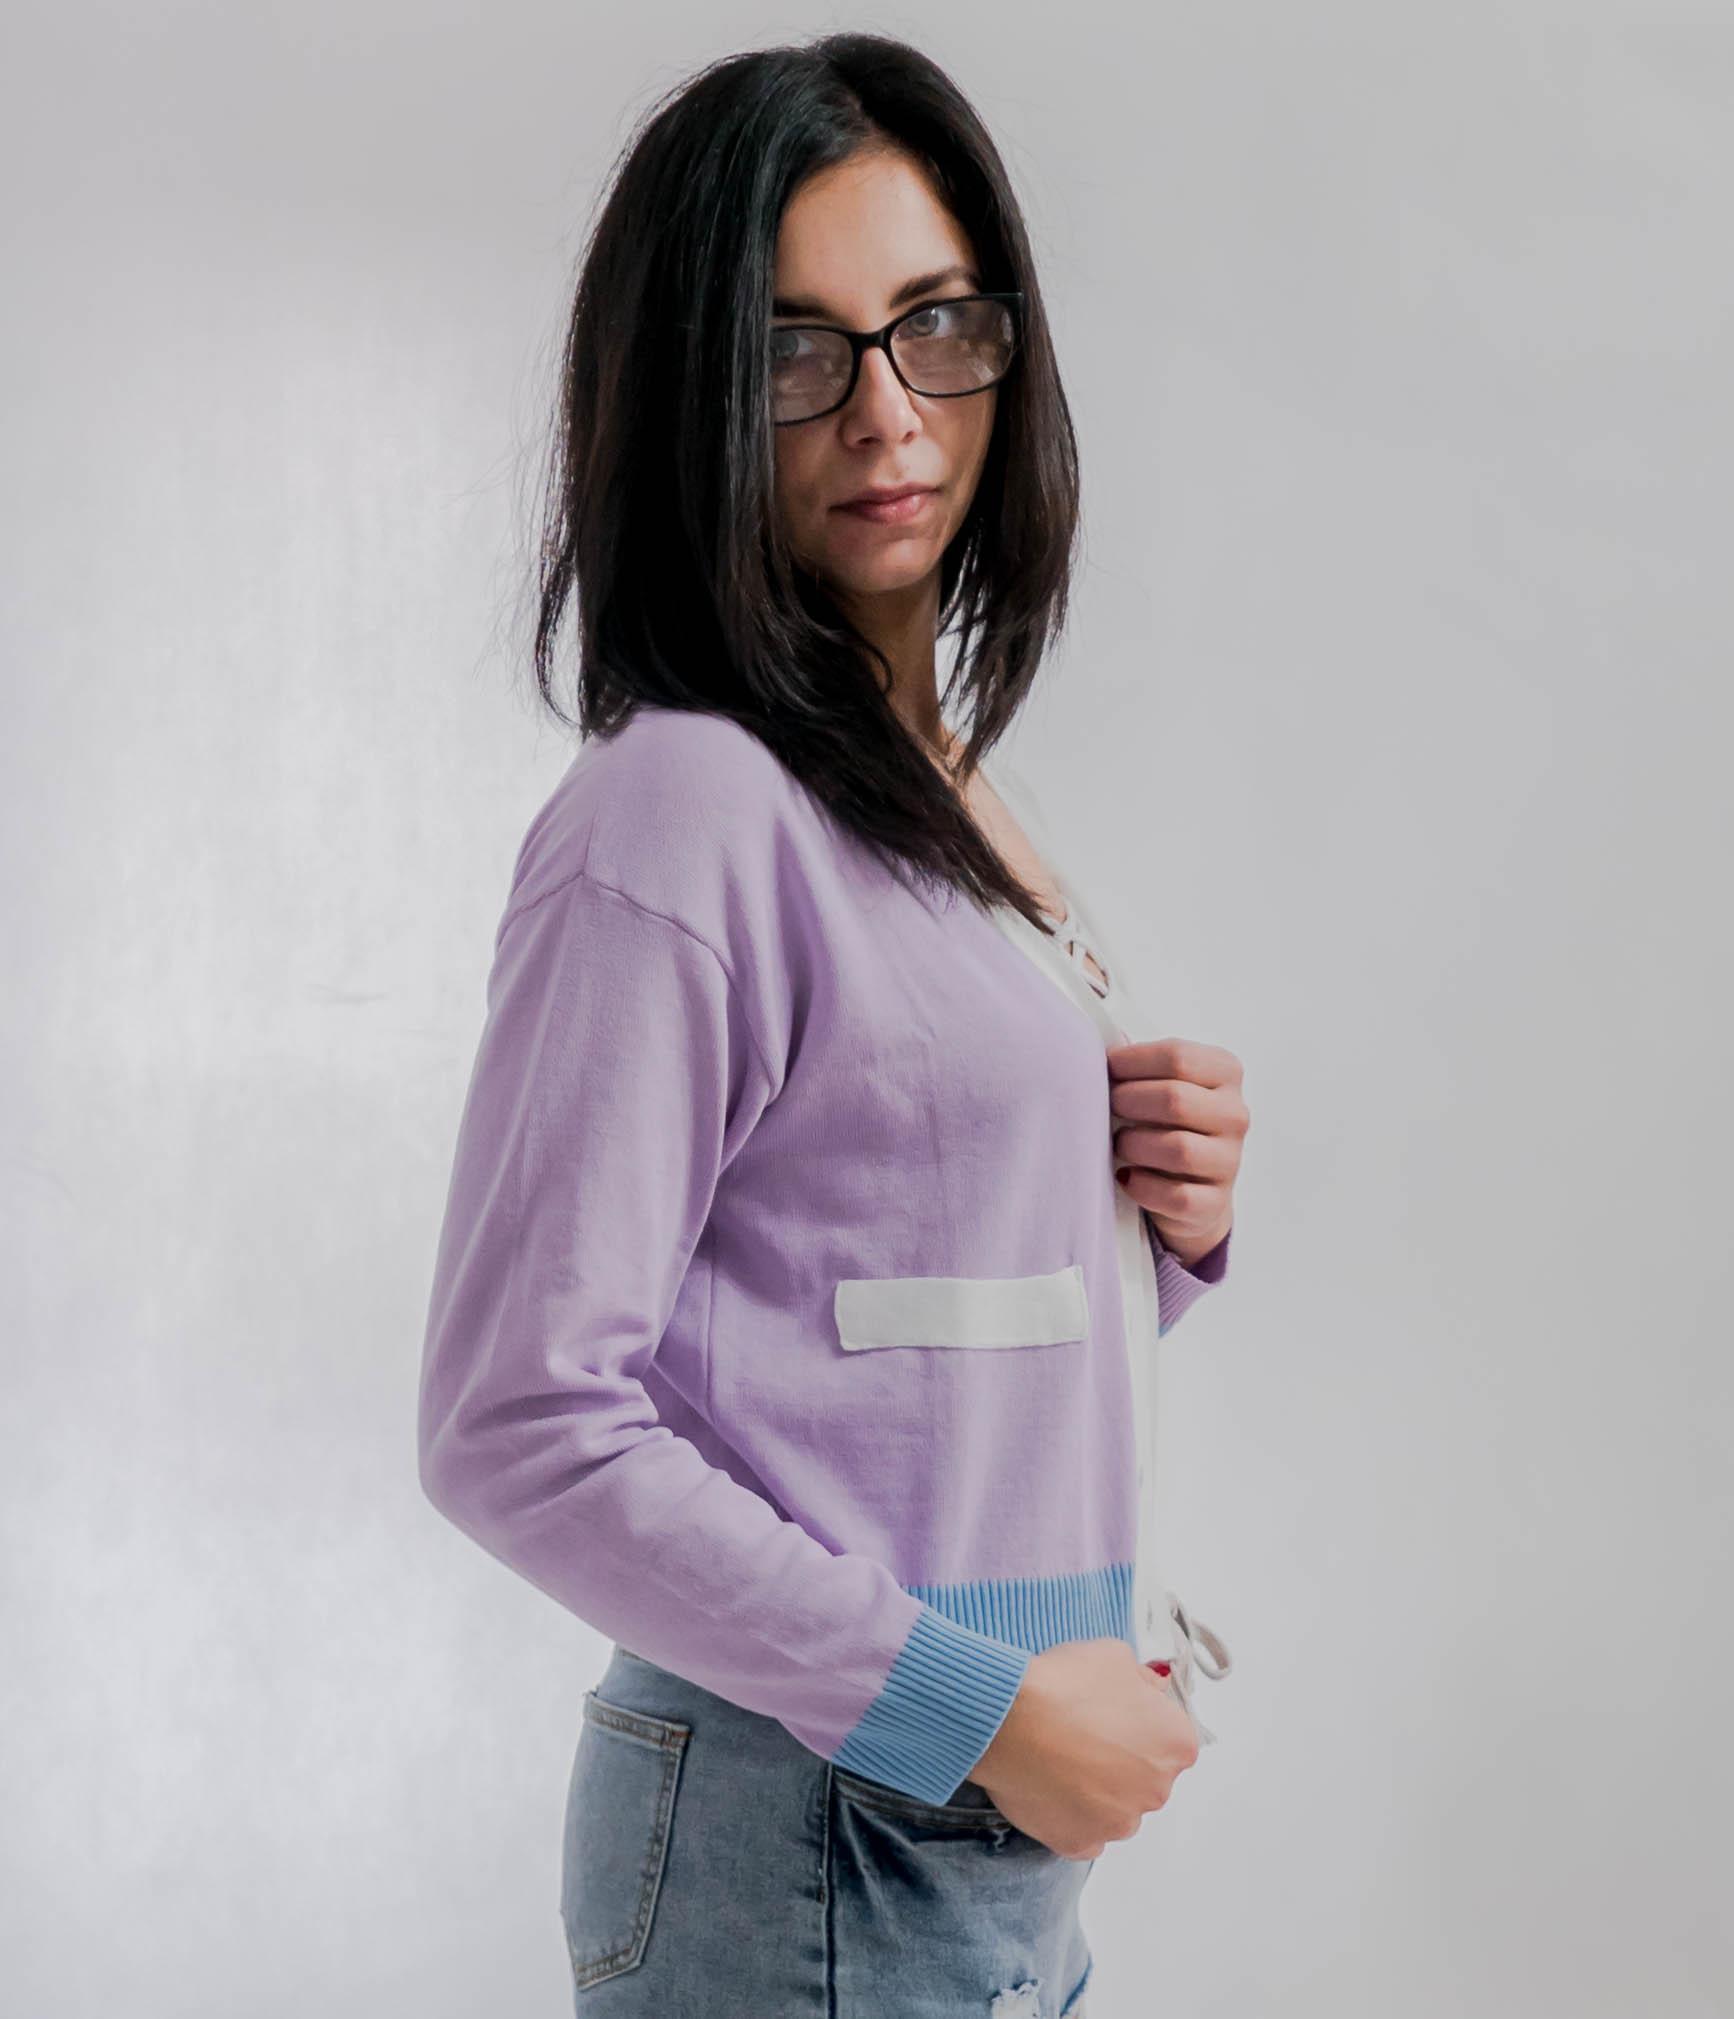 Rozpinane sweterki, kardigany na zimę 2020